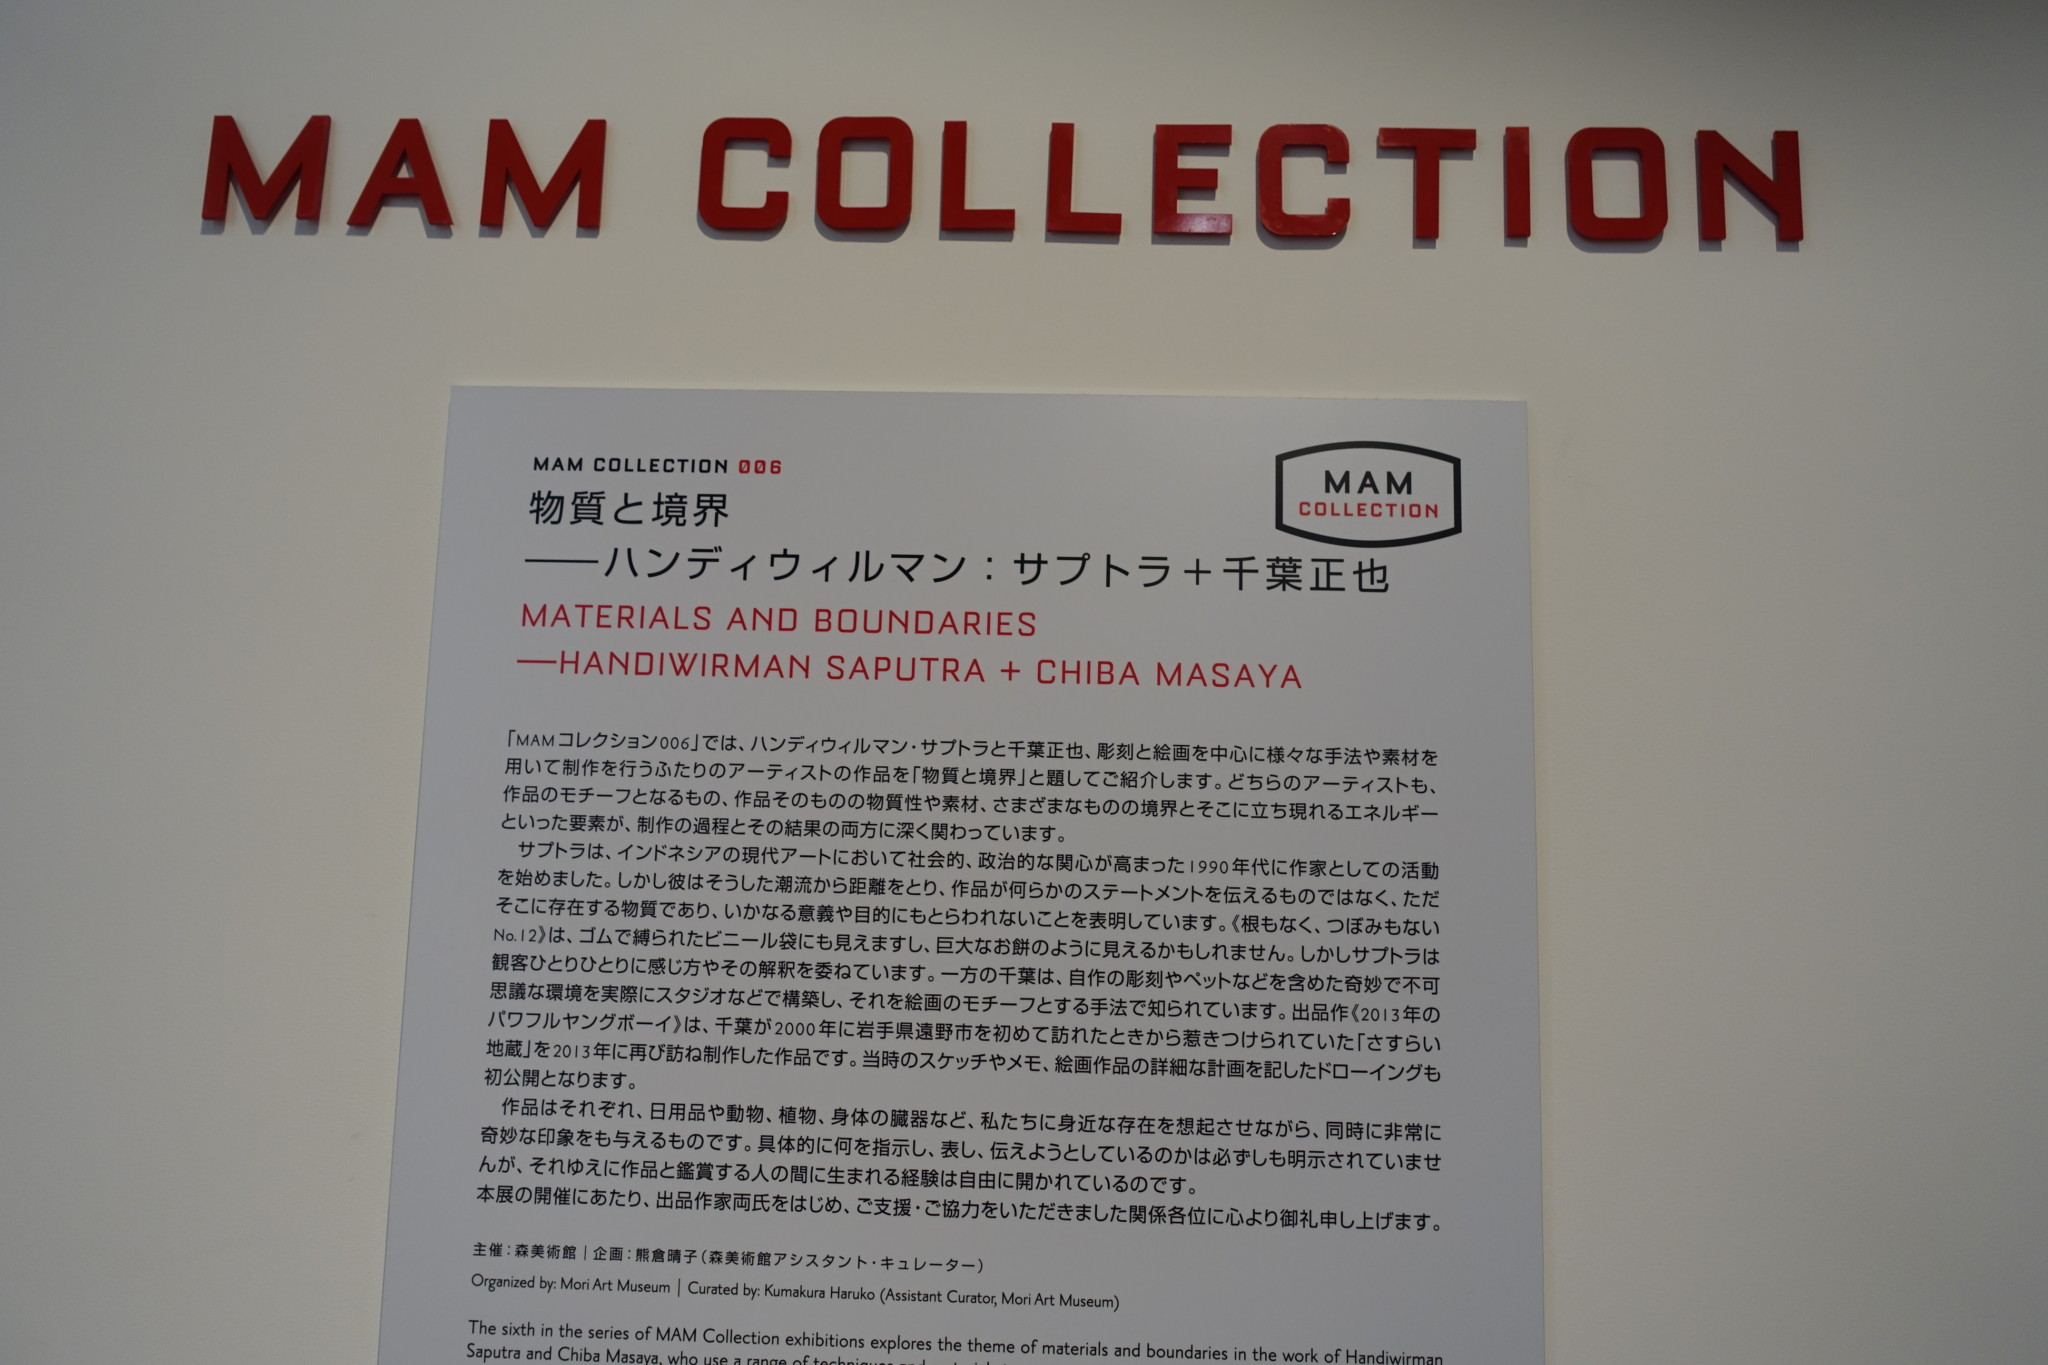 MAMコレクション006: 物質と境界- ハンディウィルマン・サプトラ + 千葉正也